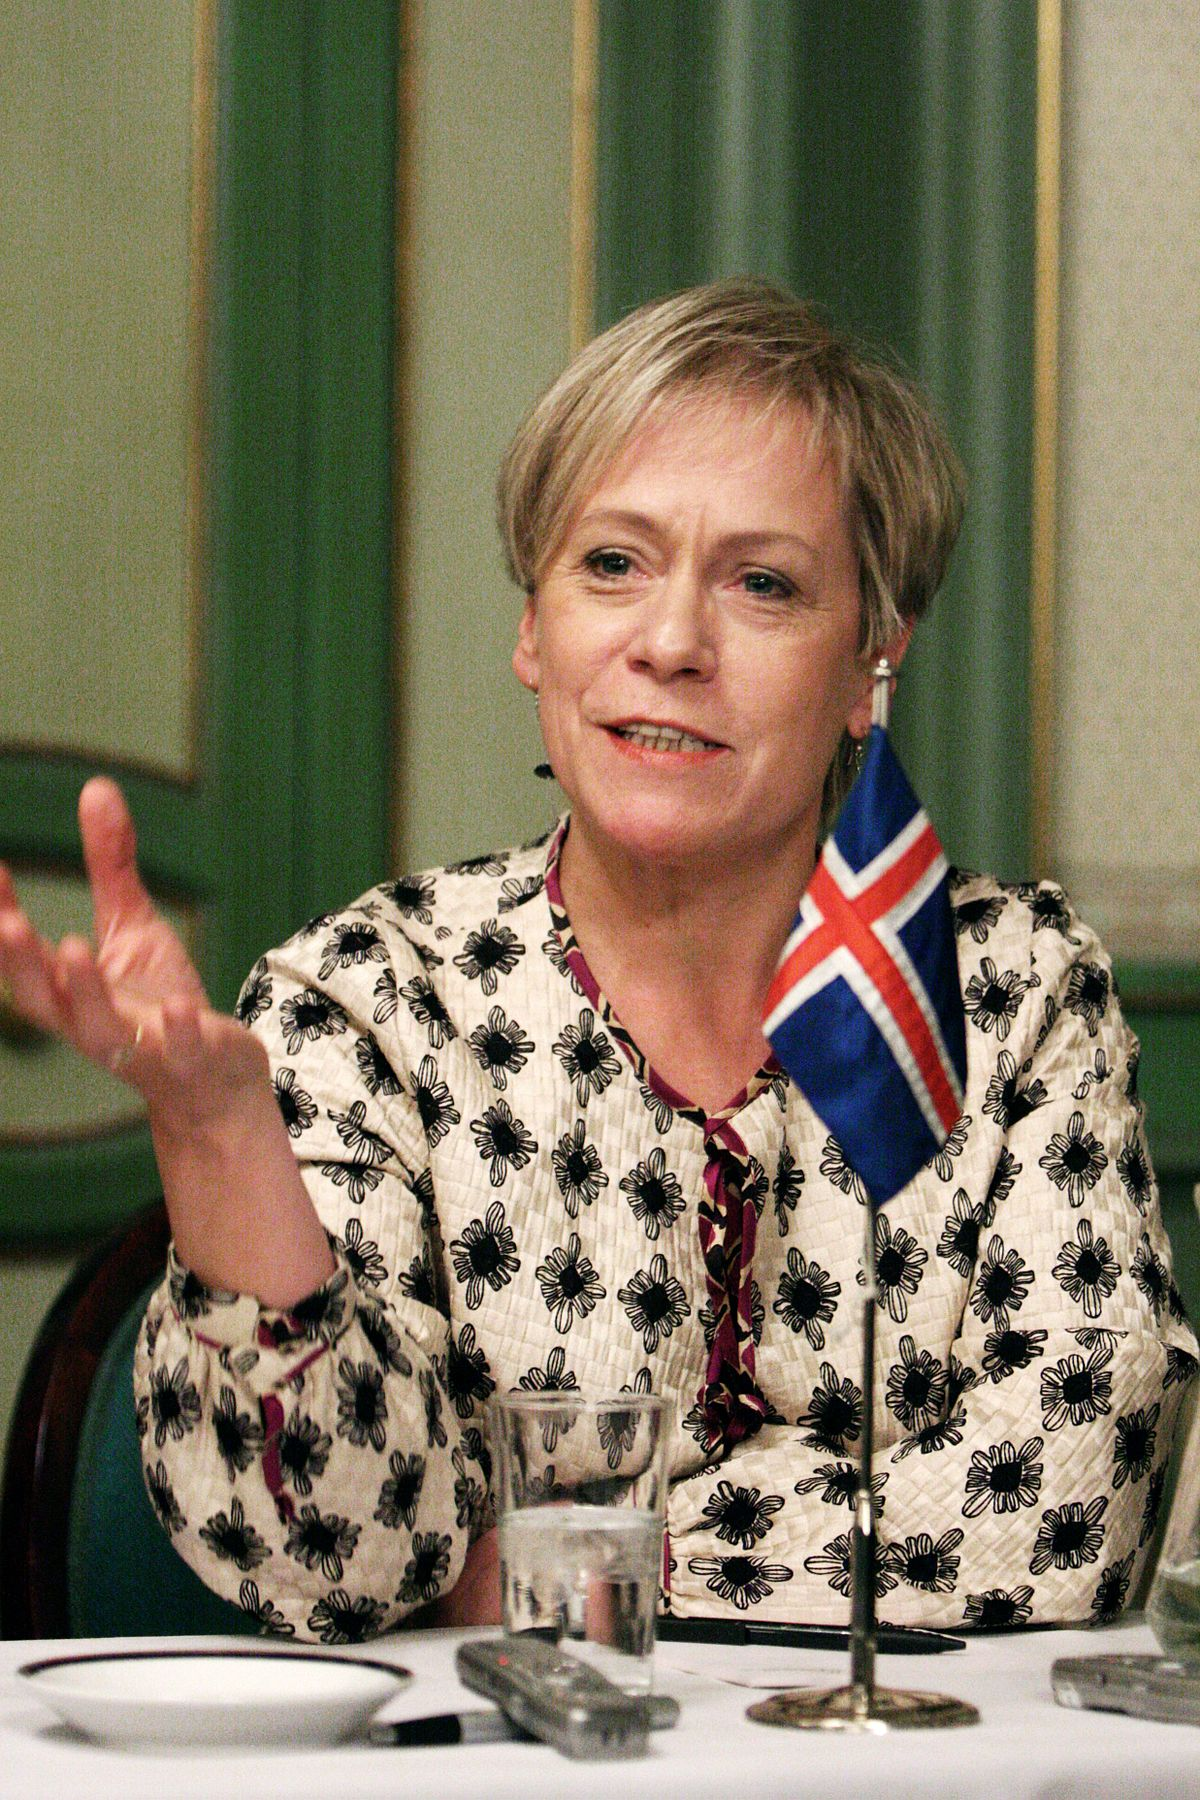 Islands_utrikesminister_Ingibjorg_Solrun_Gisladottir_vid_Nordiska_Radets_session_i_Oslo._2007-10-31._Foto-_Magnus_Froderberg-norden.org